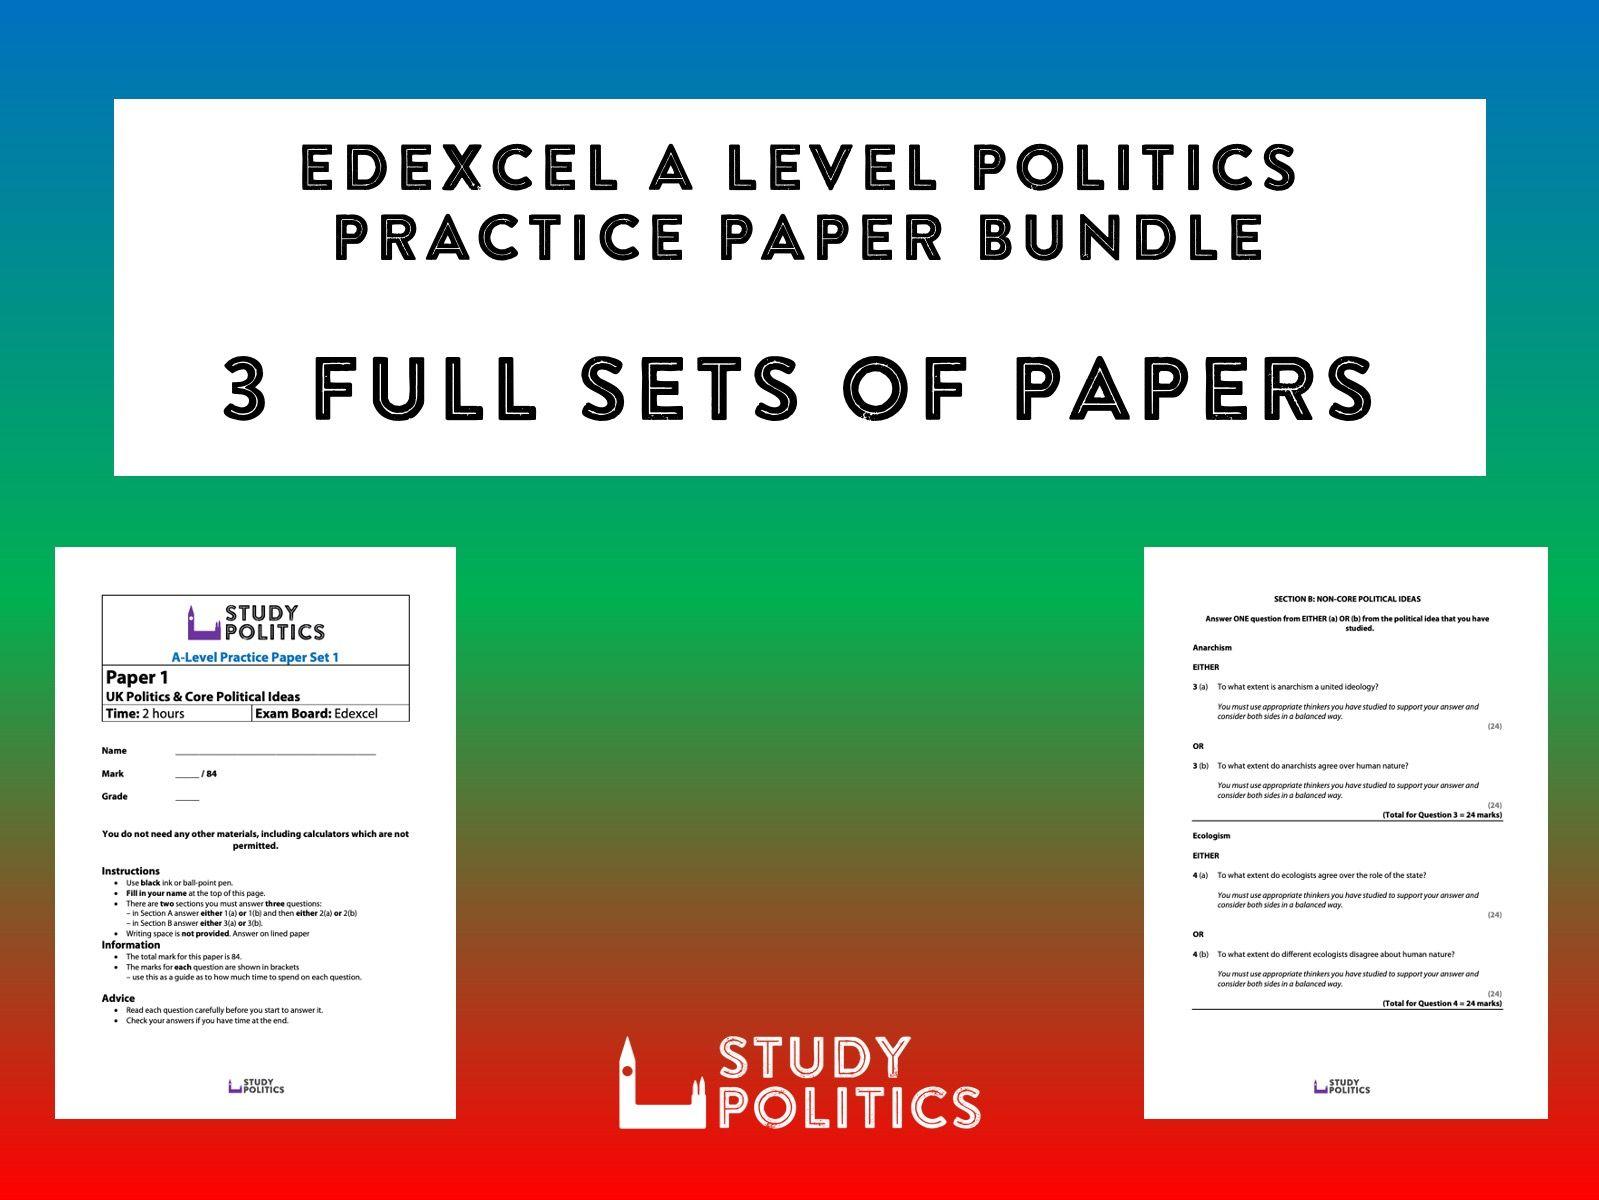 Edexcel A Level Politics Practice Paper Bundle - 3 Full Sets of Practice Papers